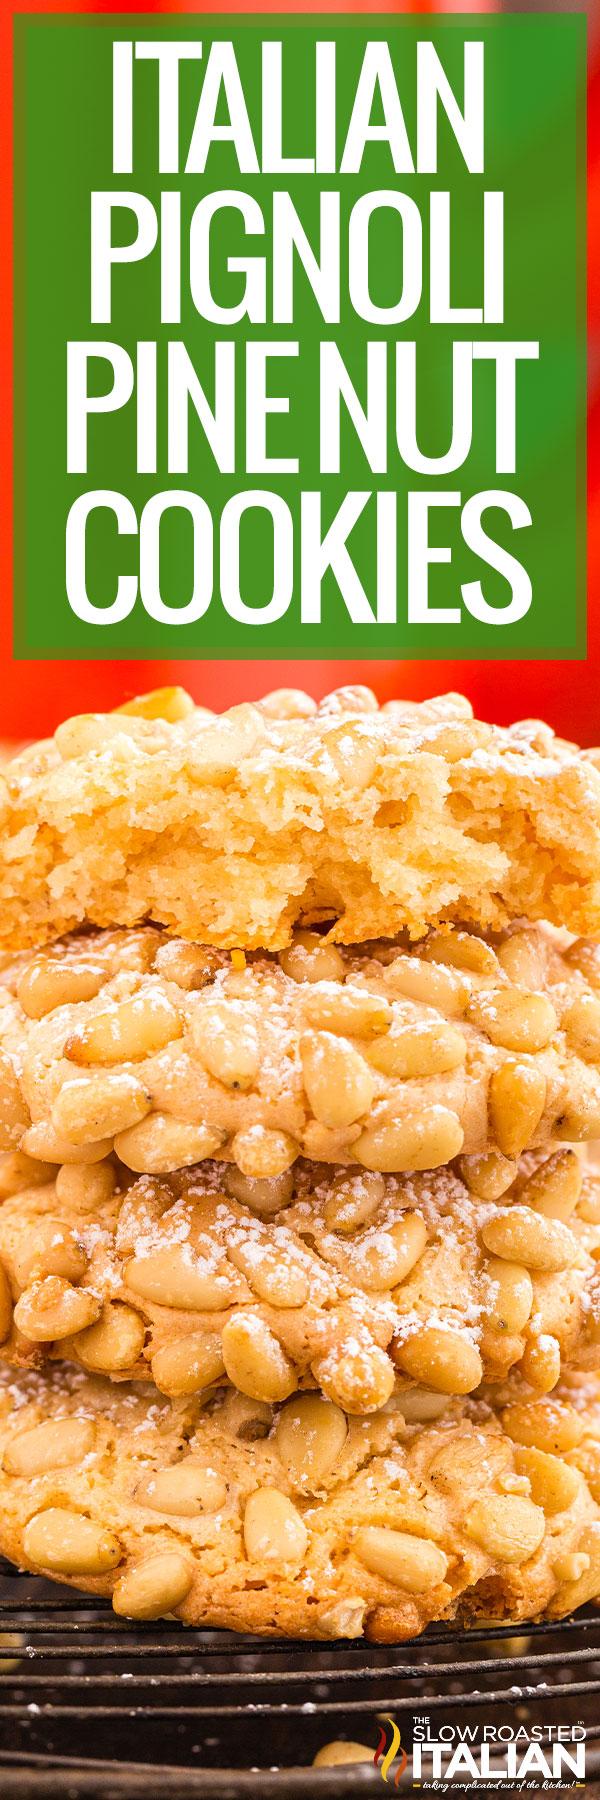 Italian Pignoli Cookies (Pine Nut Cookies) closeup